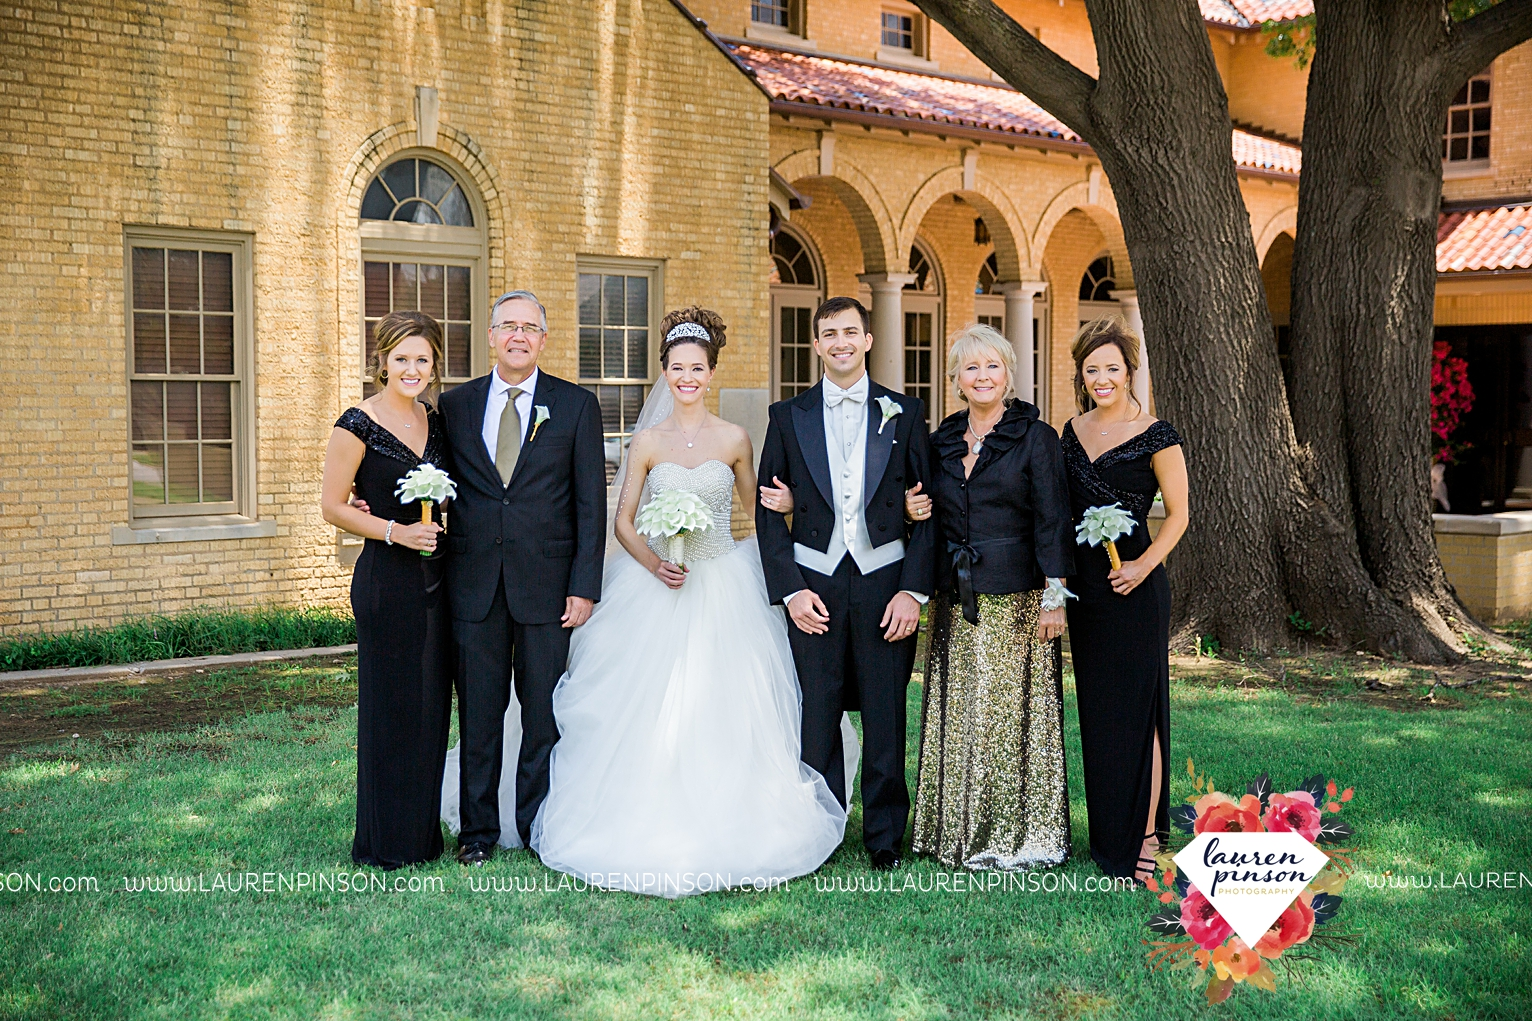 wichita-falls-texas-wedding-photographer-the-forum-by-the-kemp-mayfield-events-ulta-gold-glitter_2848.jpg